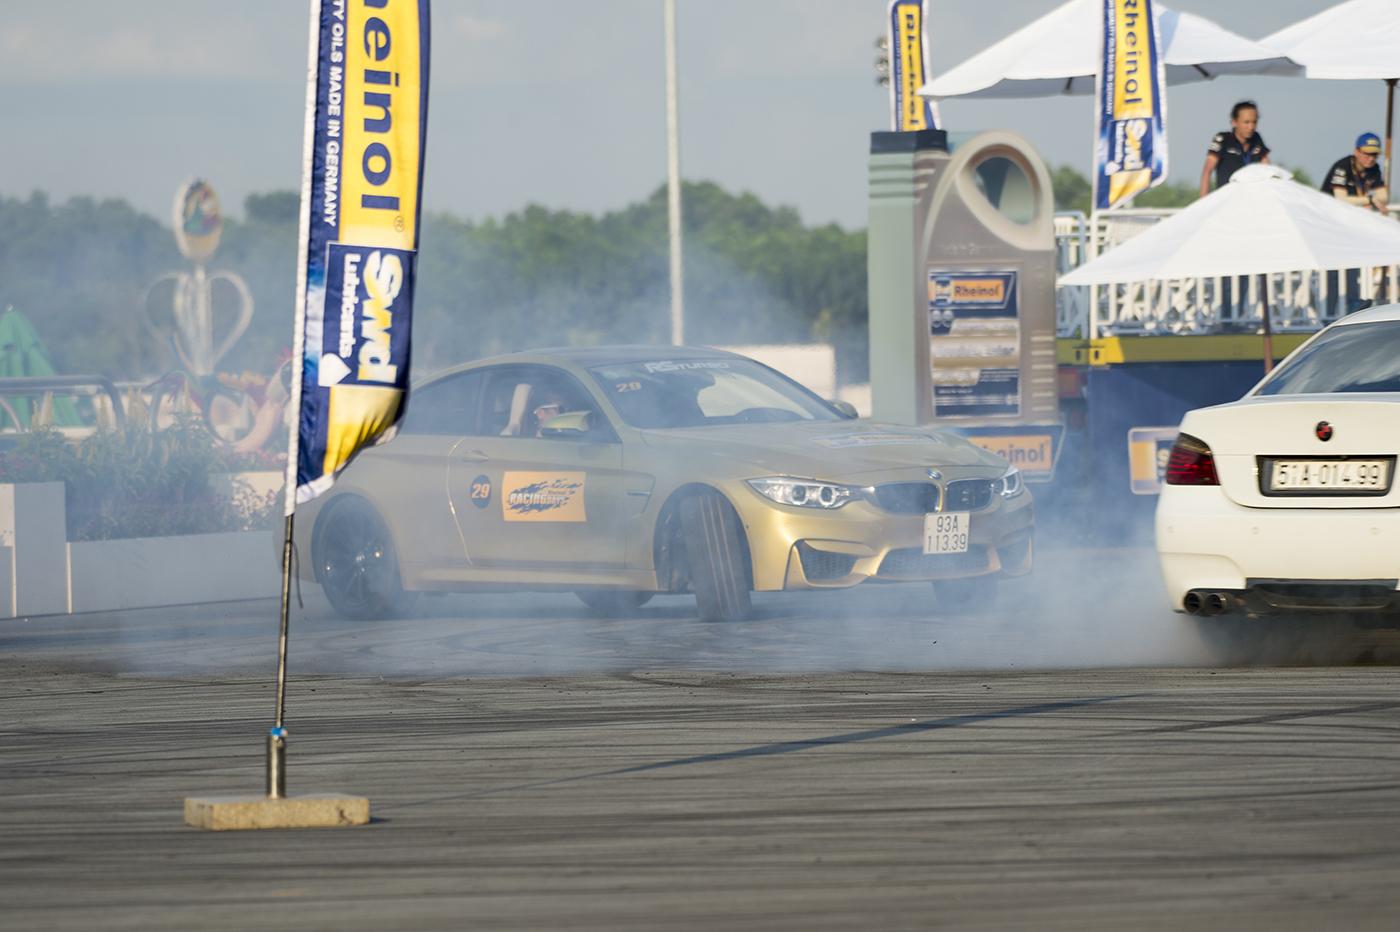 rheinol-racing-days-autodaily-0-83.jpg